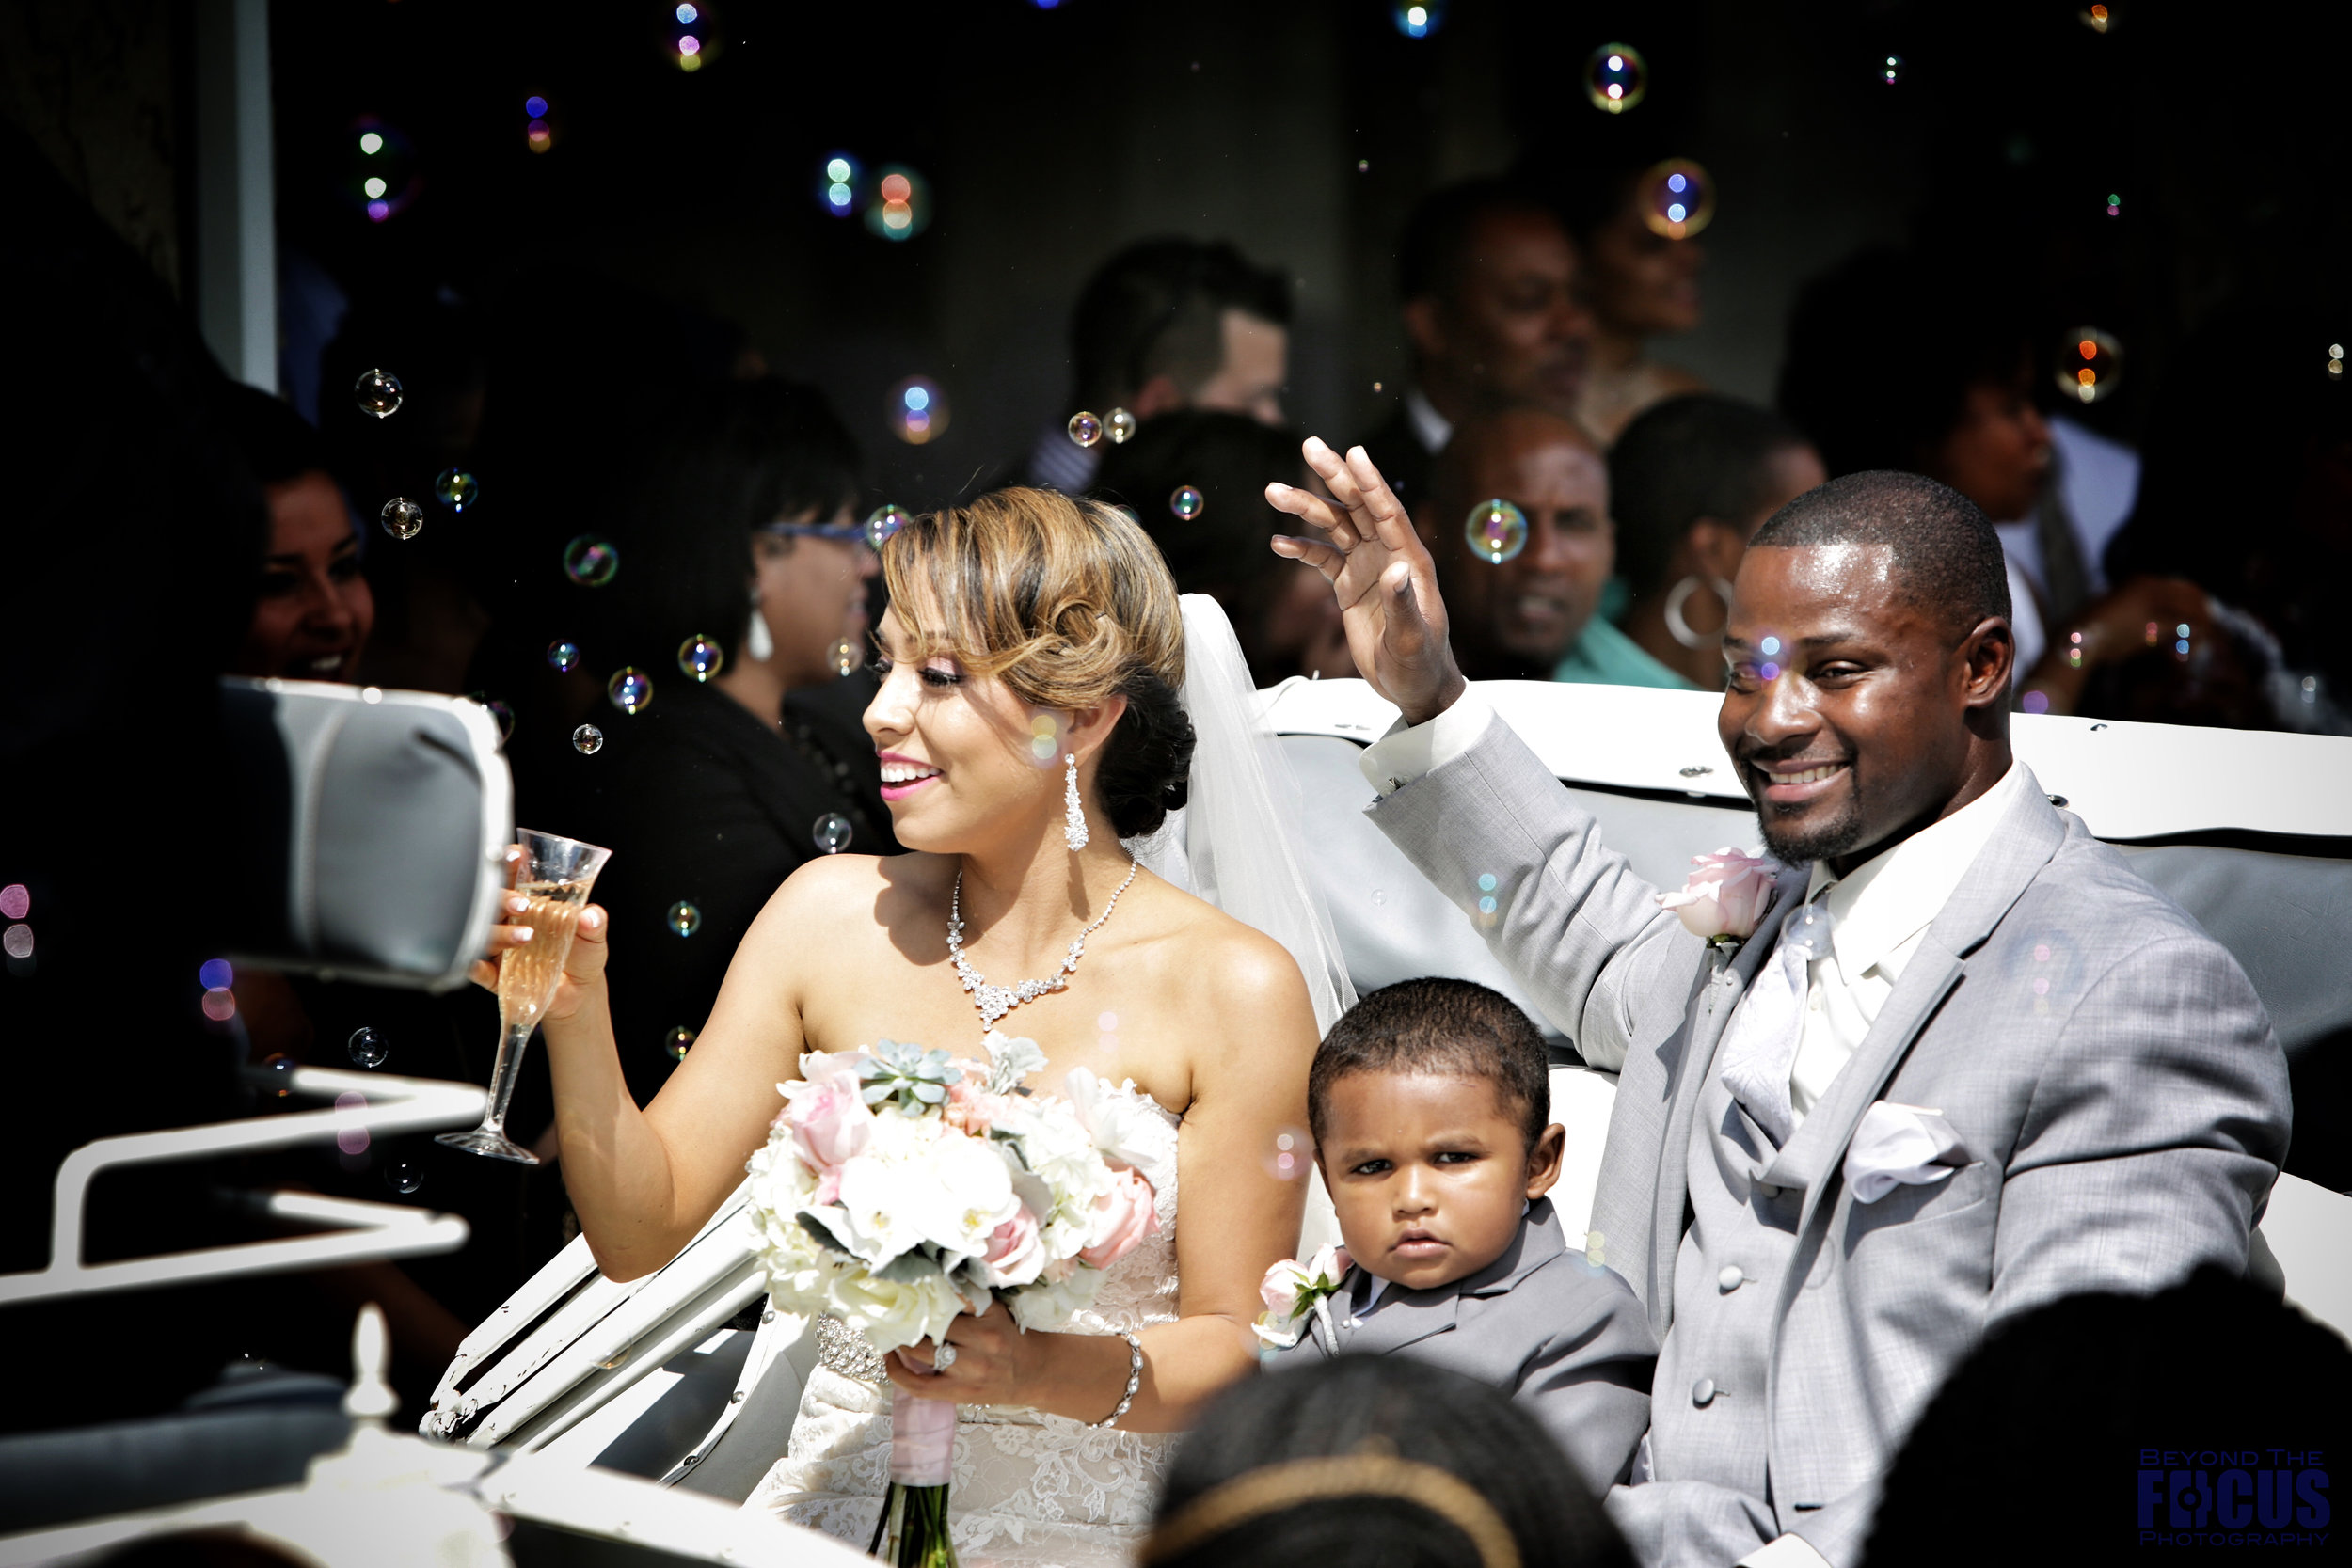 Palmer Wedding - Wedding Ceremony55.jpg